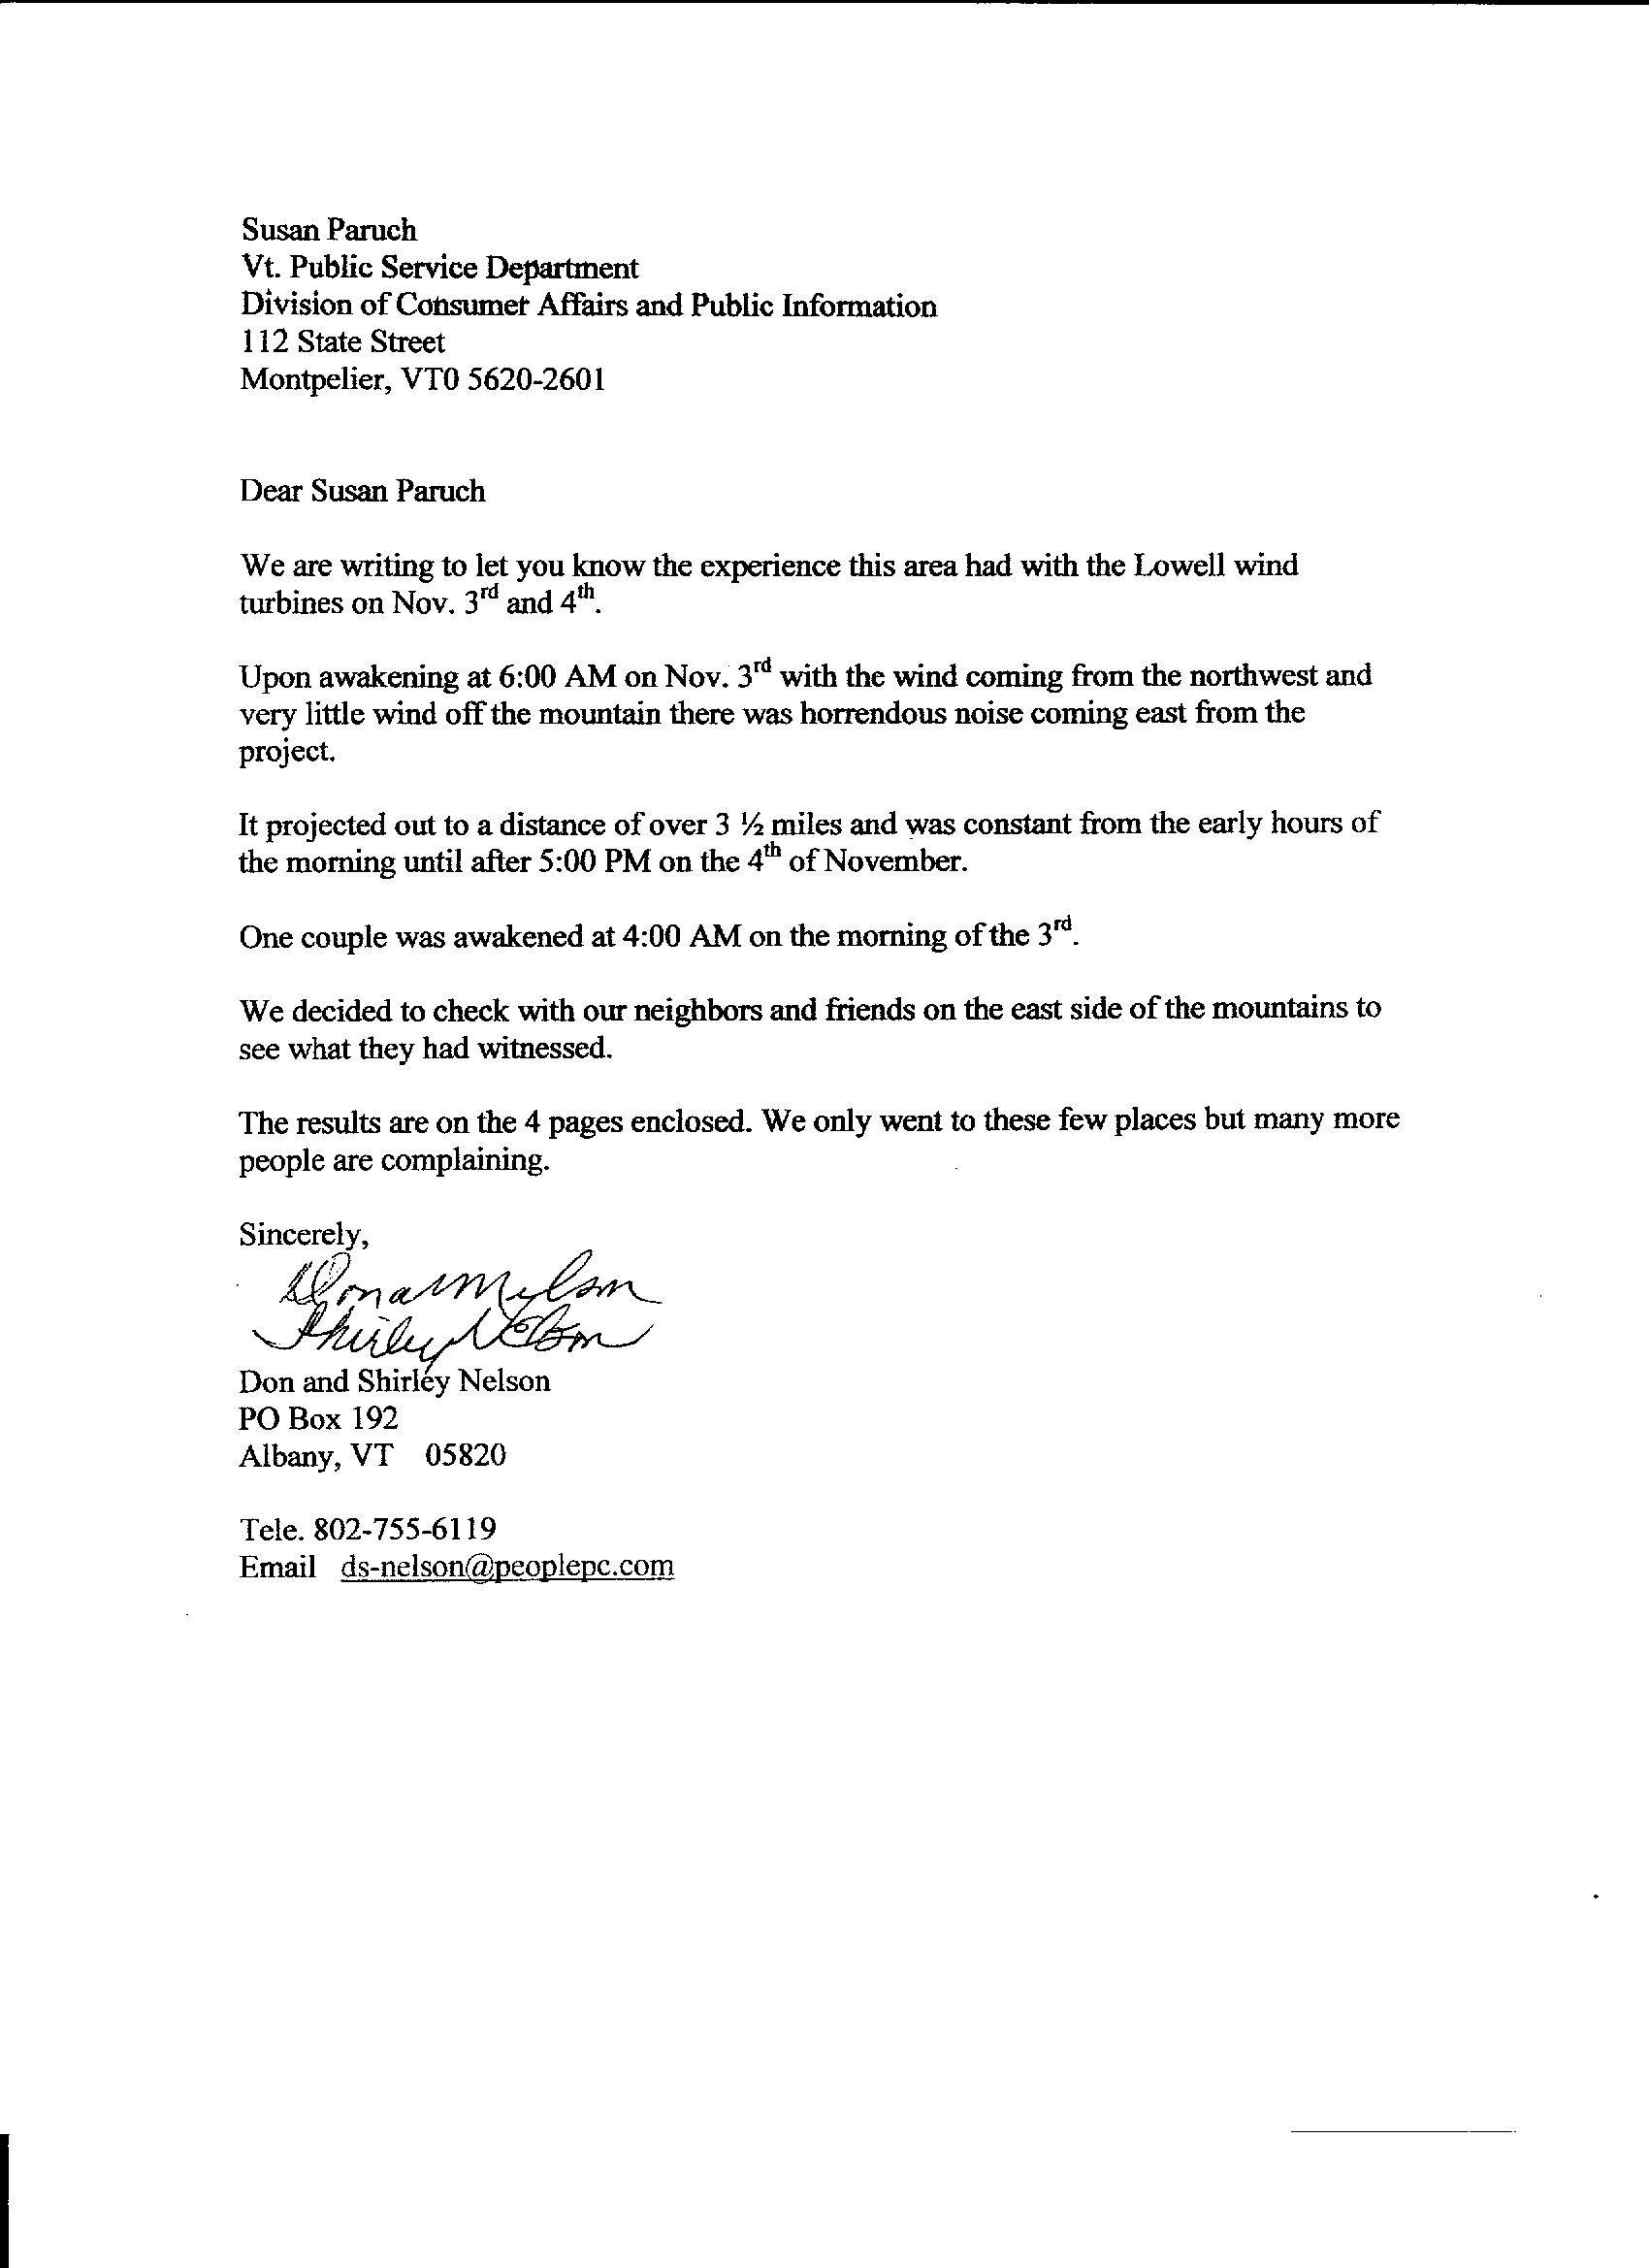 noise complaint letter a could be written